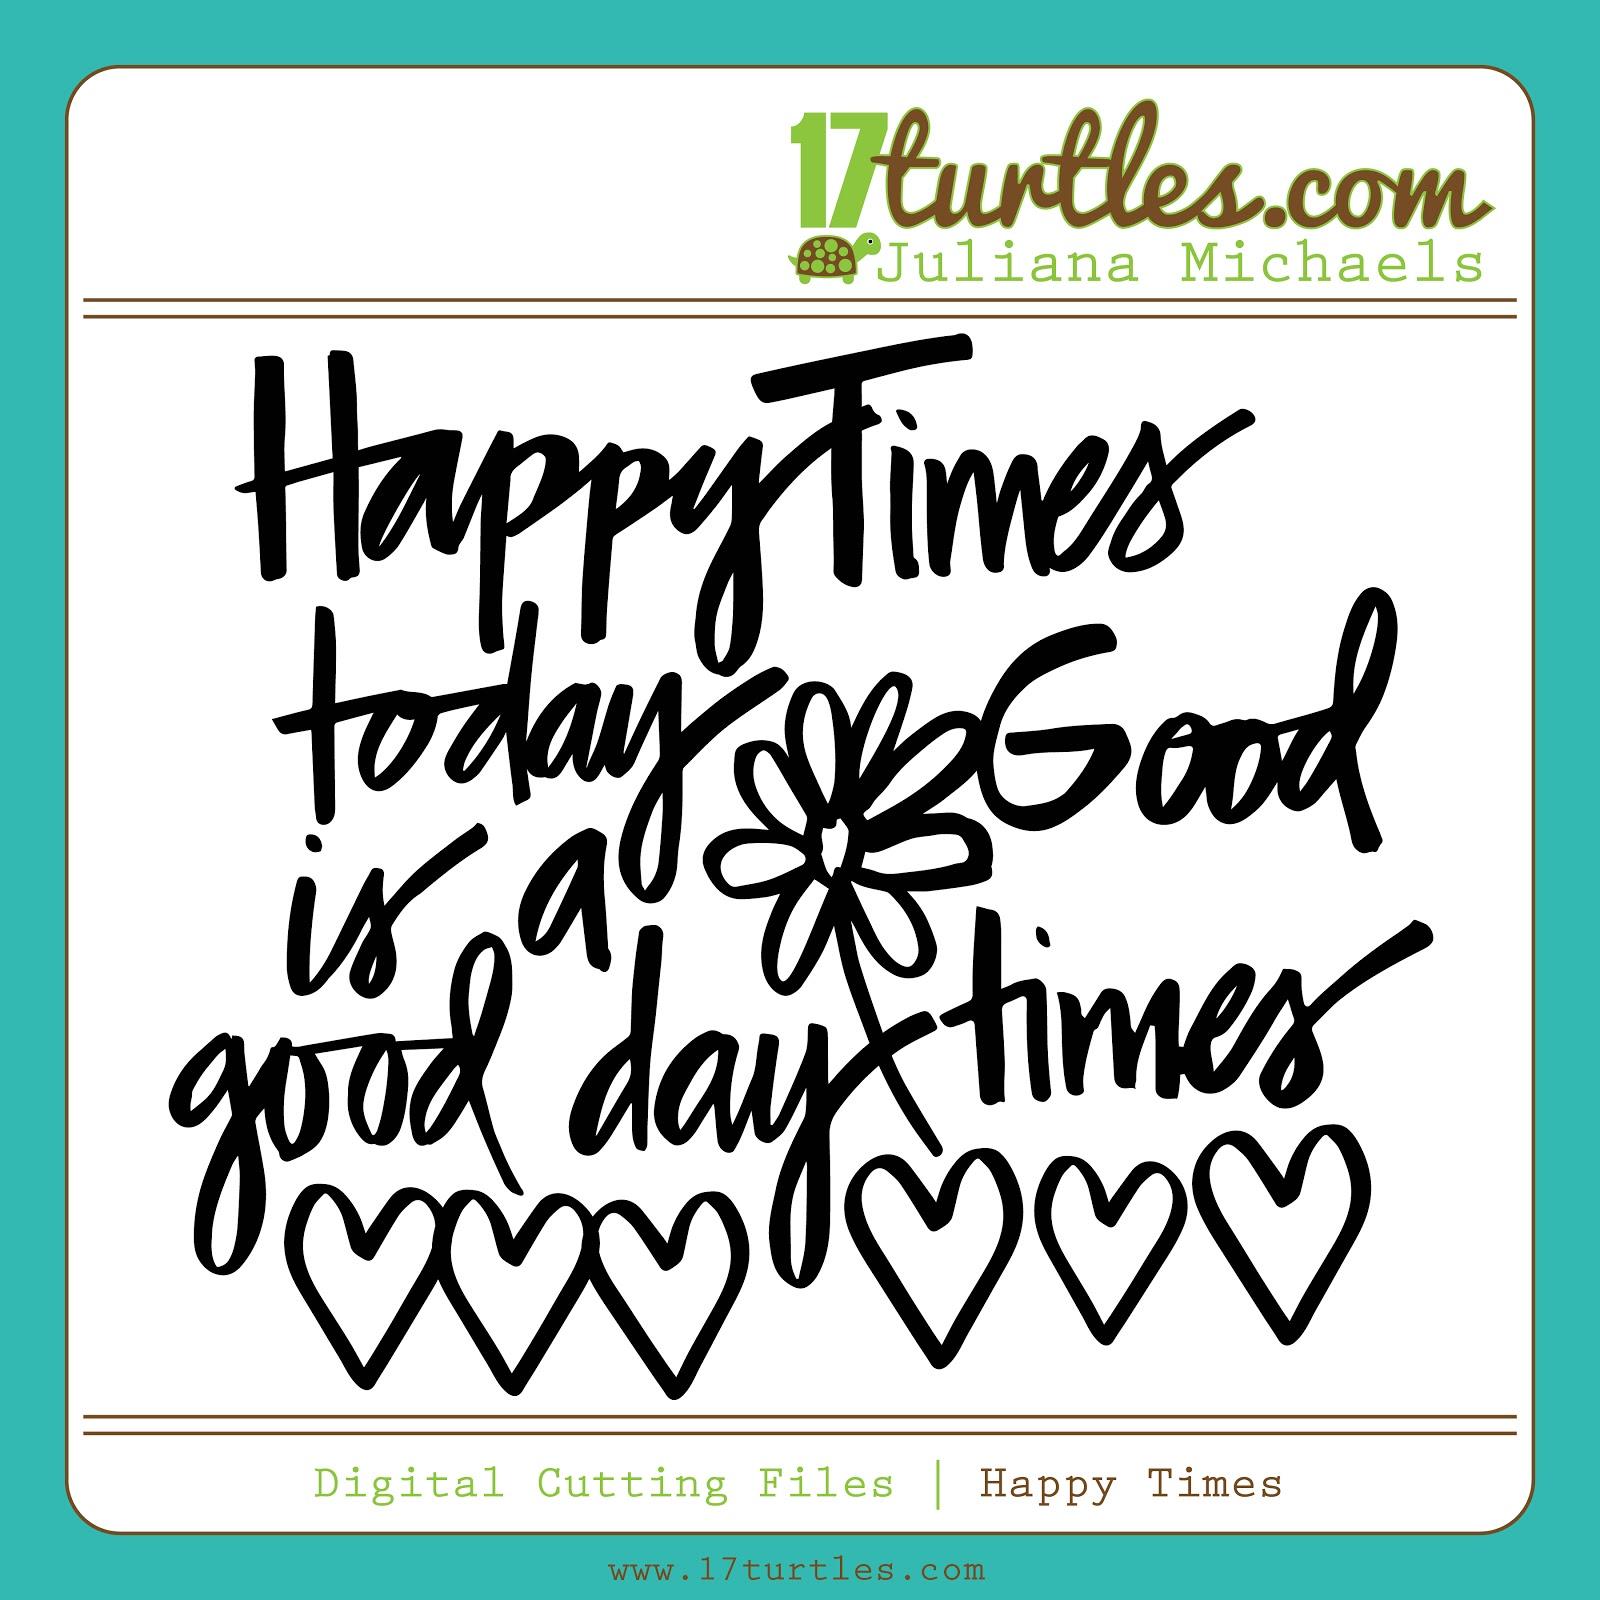 http://4.bp.blogspot.com/-bwTBP307BRk/U4fTZZU0ecI/AAAAAAAARKU/vznvlyddwjk/s1600/Happy_Times_Juliana_Michaels.jpg